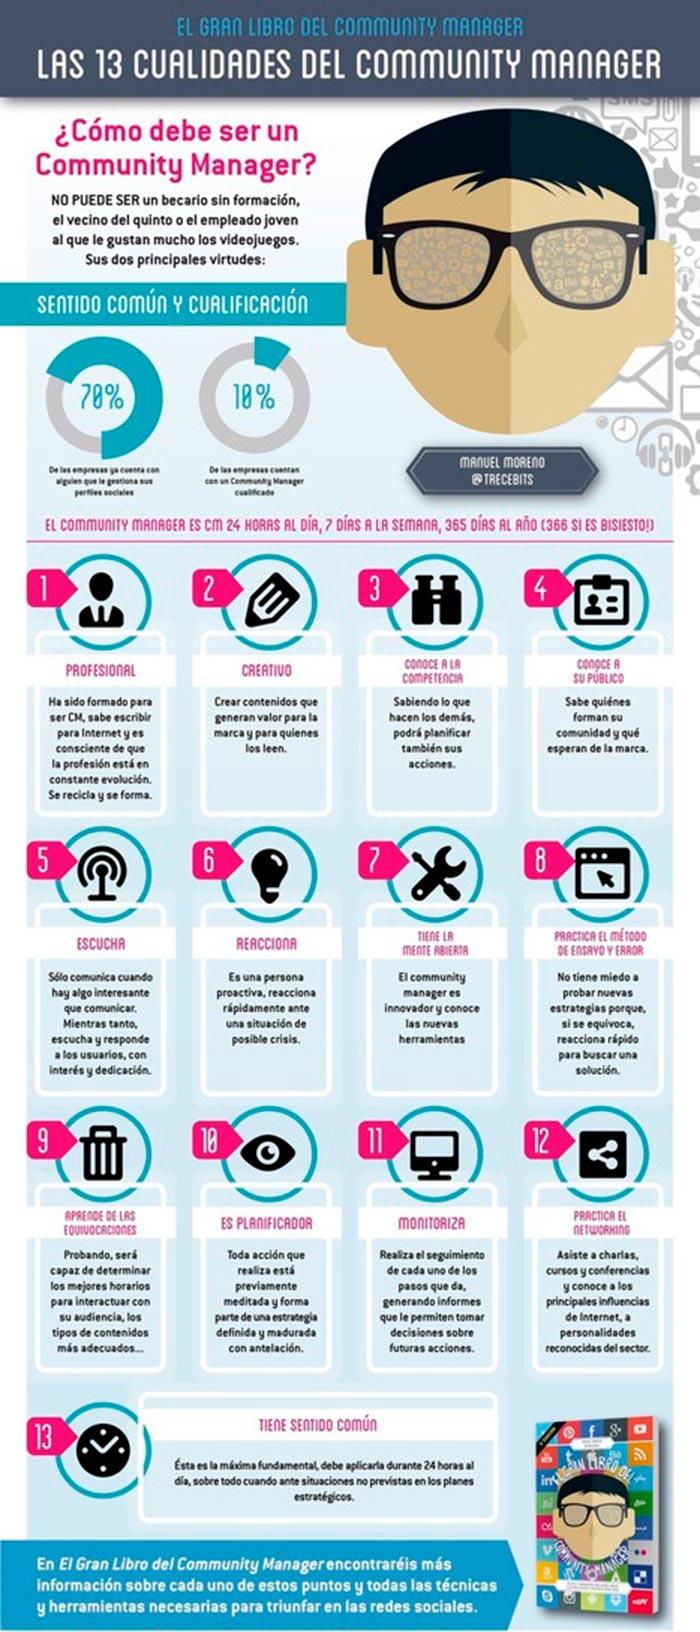 Infografia sobre las 13 cualidades del community manager